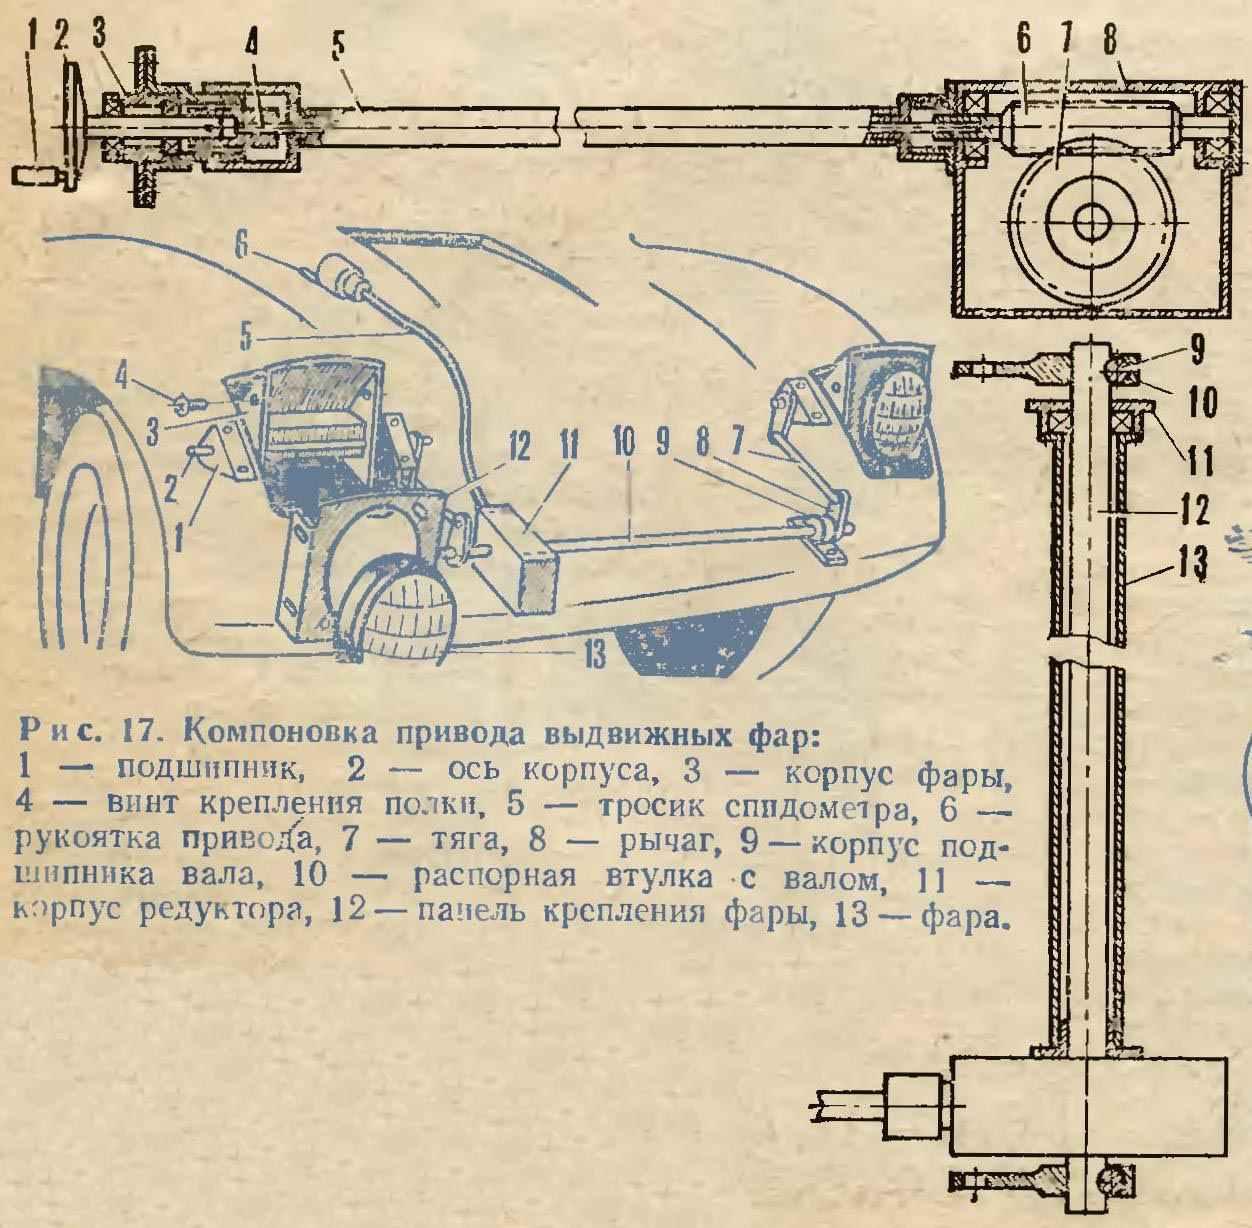 Рис. 17. Компоновка привода выдвижных фар Рис. 18. Механизм привода фар